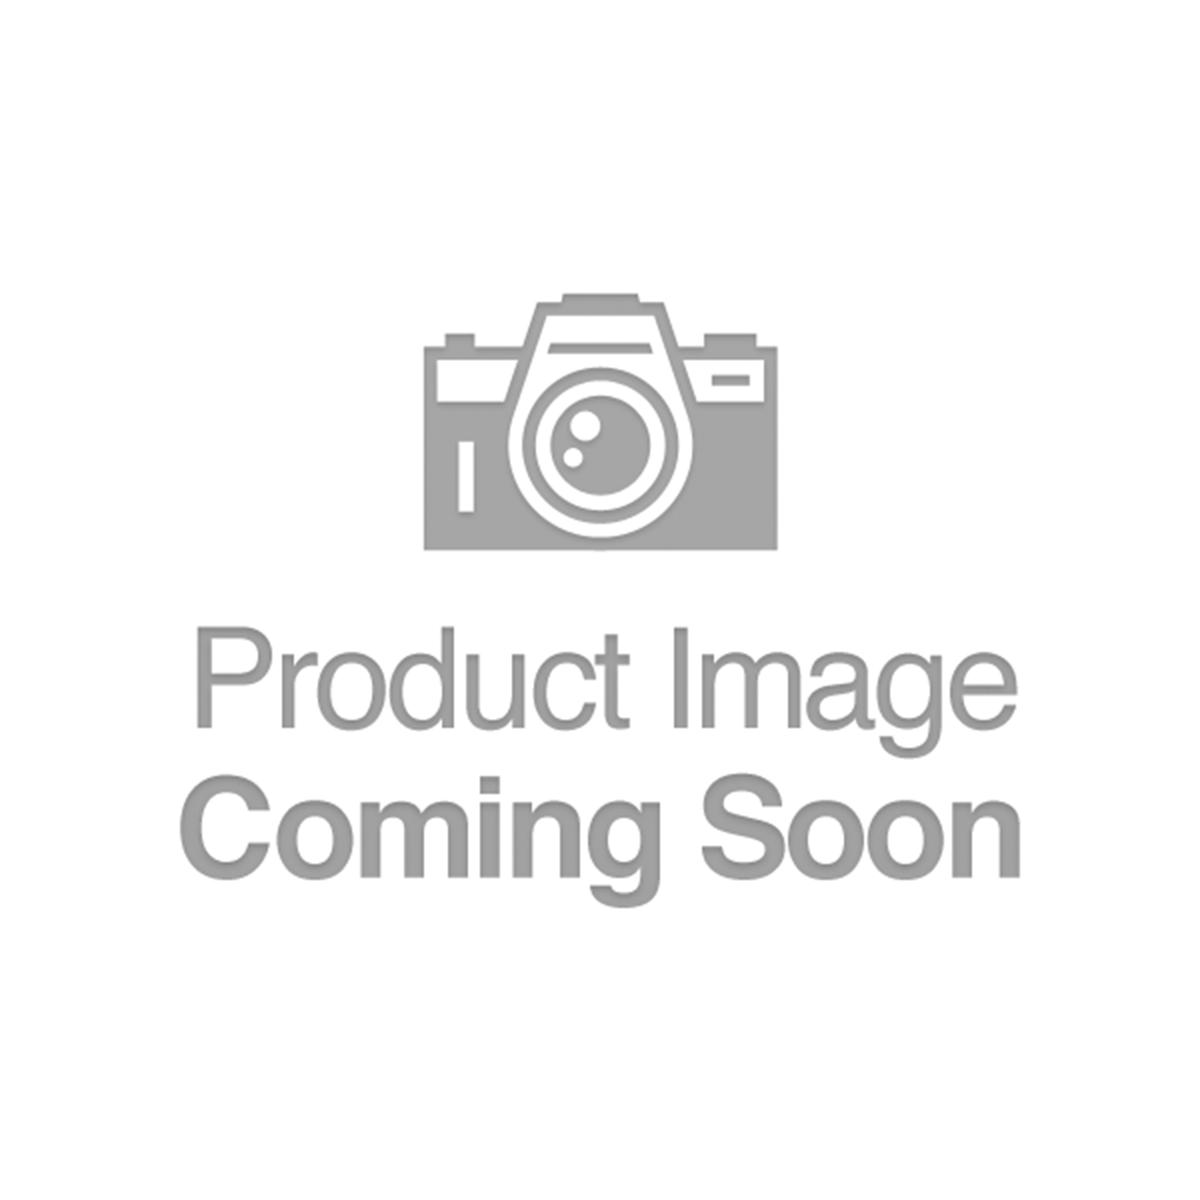 Arlington – Iowa – CH 9664 – FR 606 – PMG 25